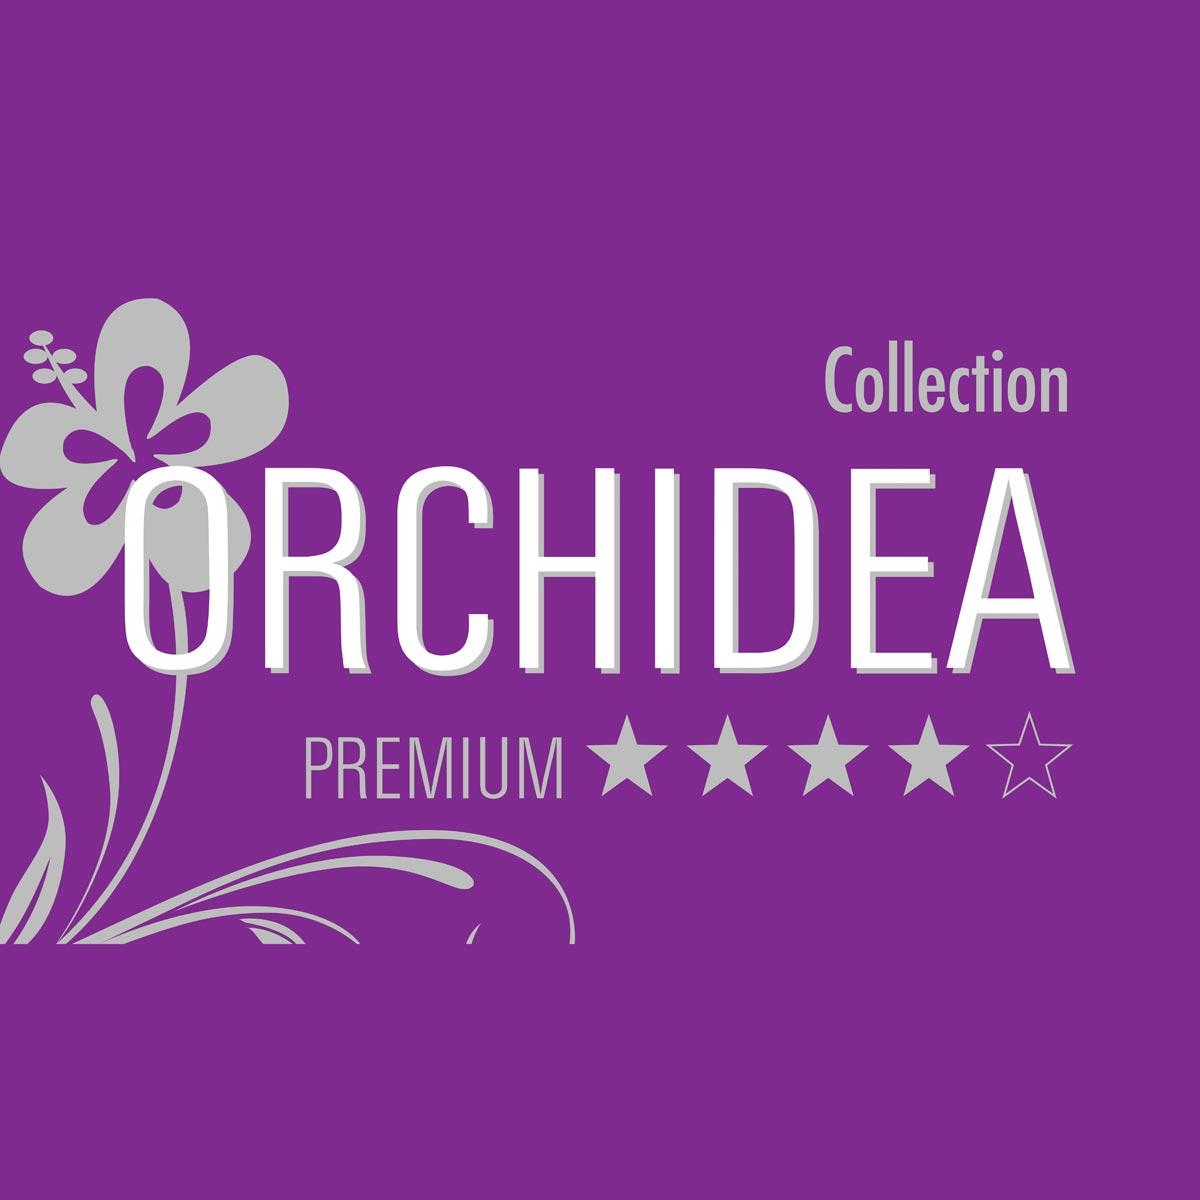 schlafstil daunendecke orchidea classic 100 daunen g nstig online kaufen bei bettwaren shop. Black Bedroom Furniture Sets. Home Design Ideas